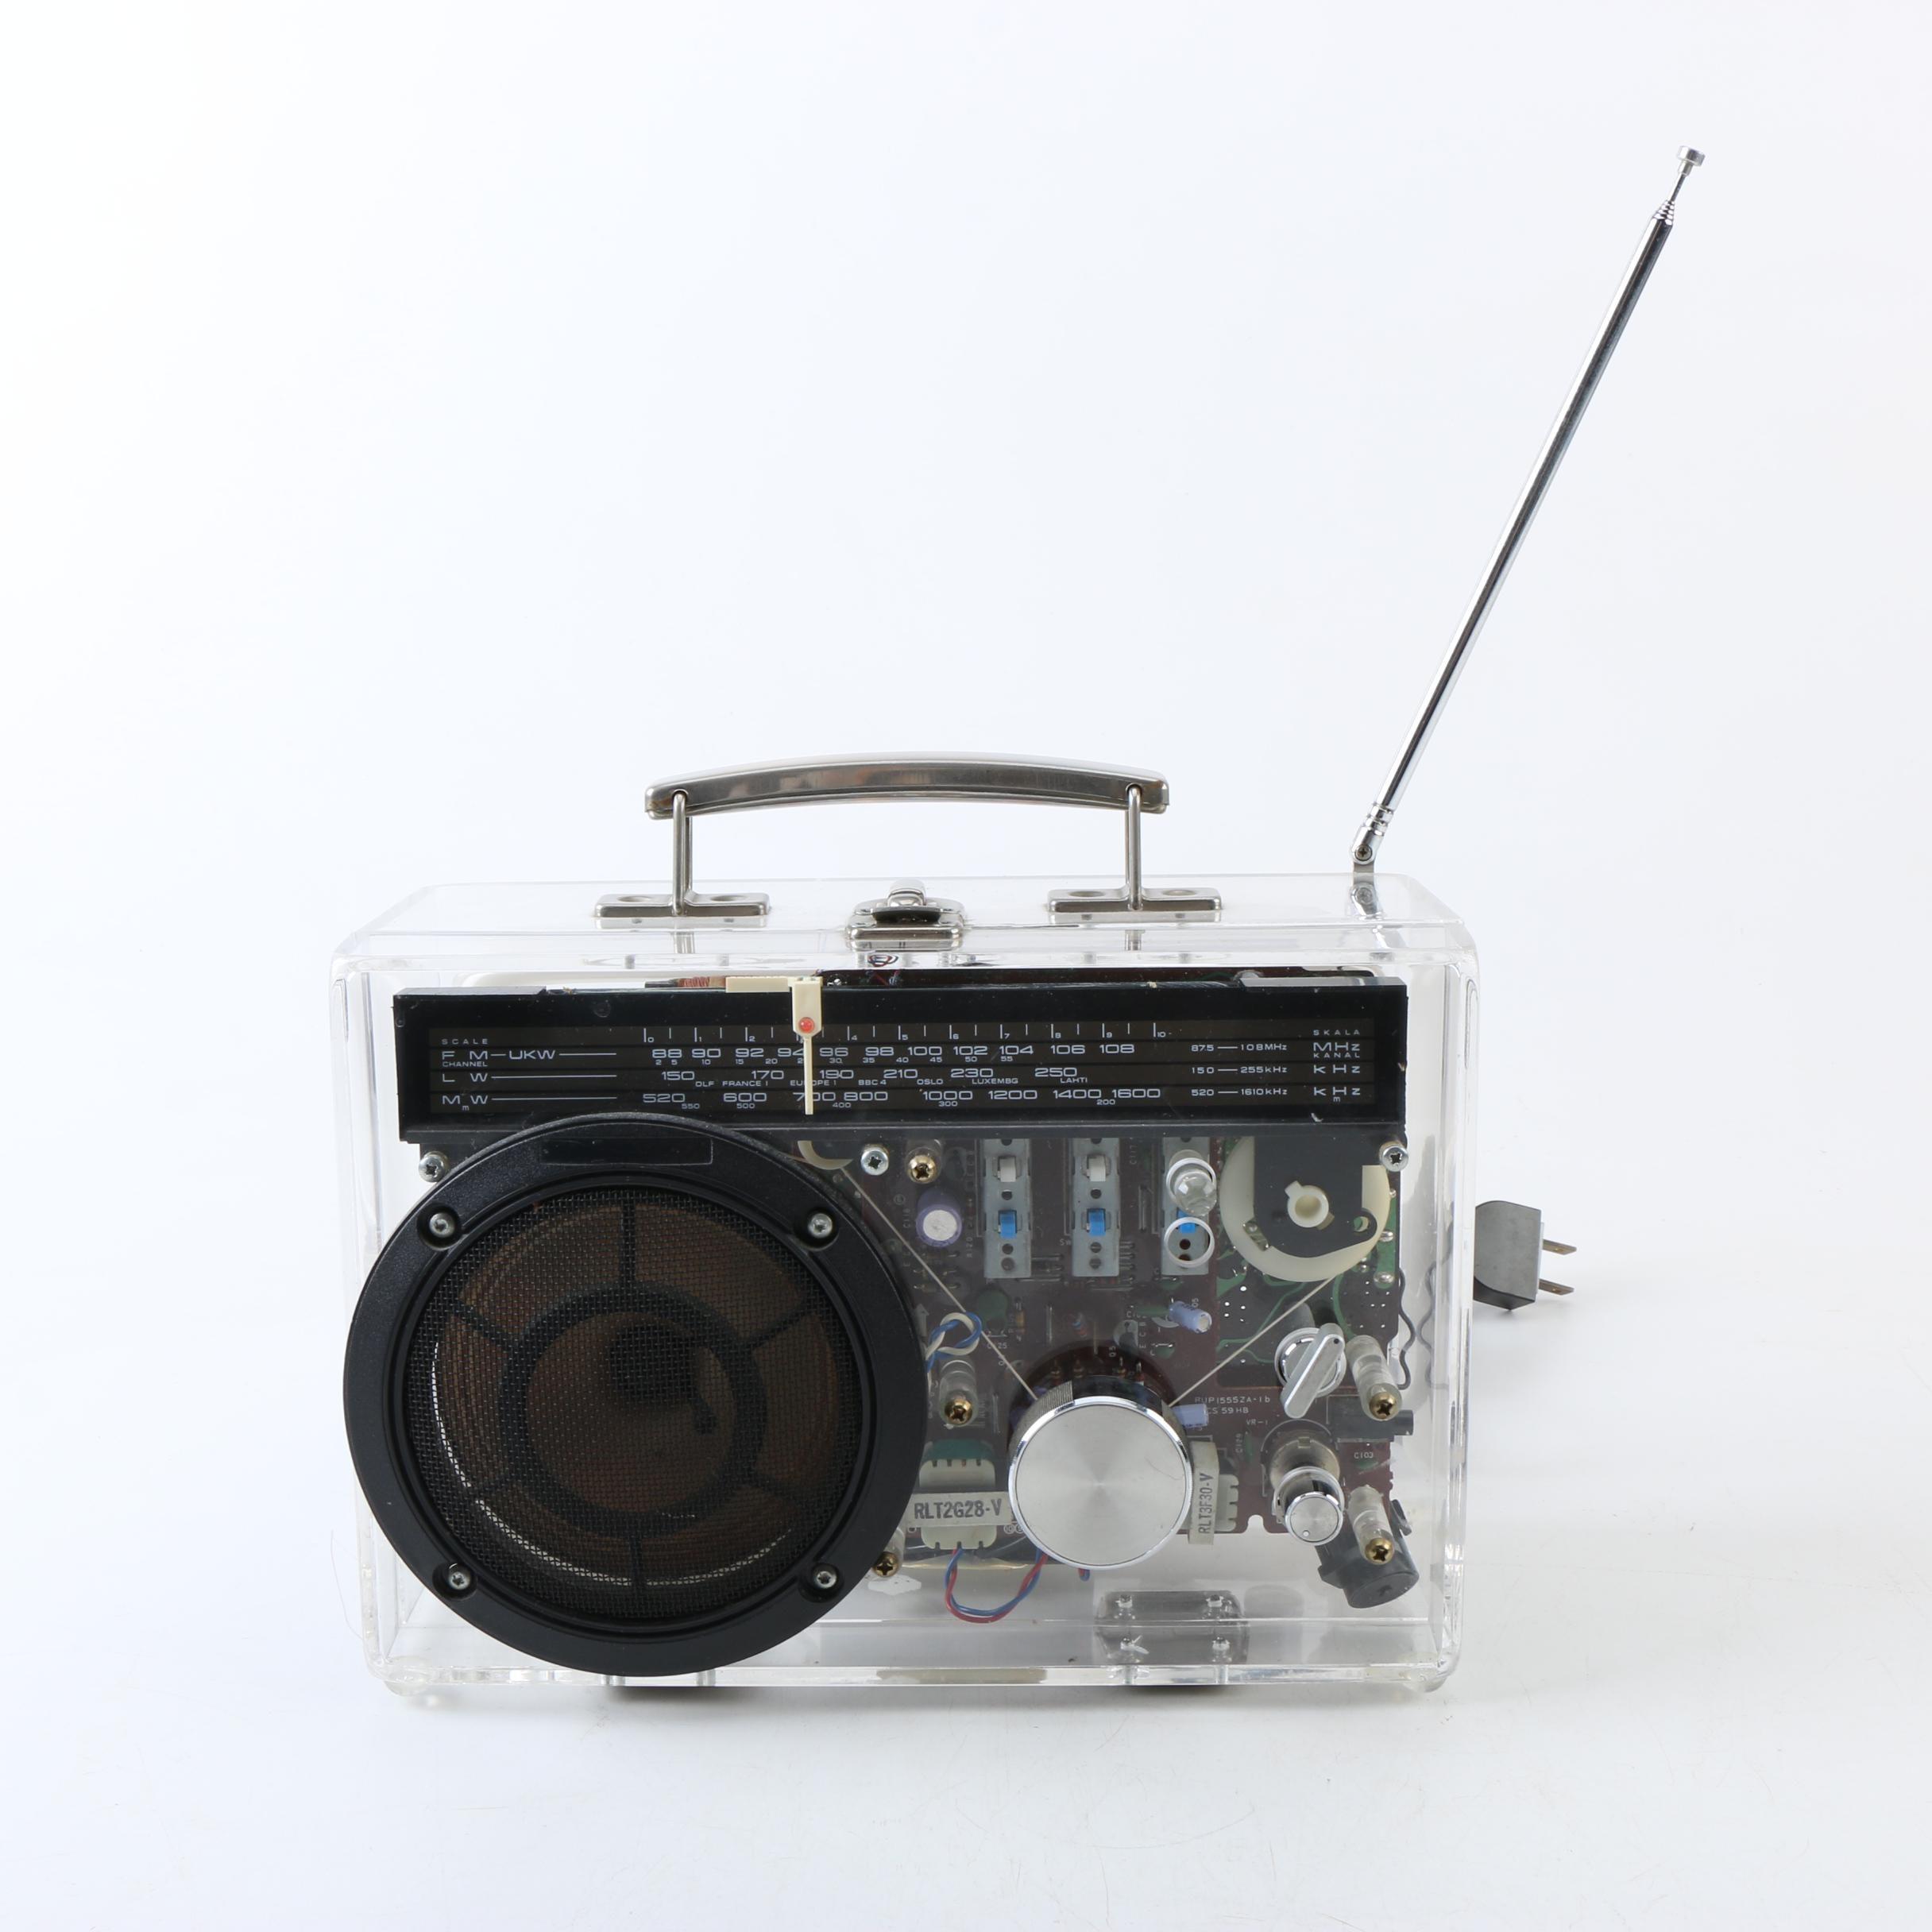 Vintage Dapy Illuminated Radio